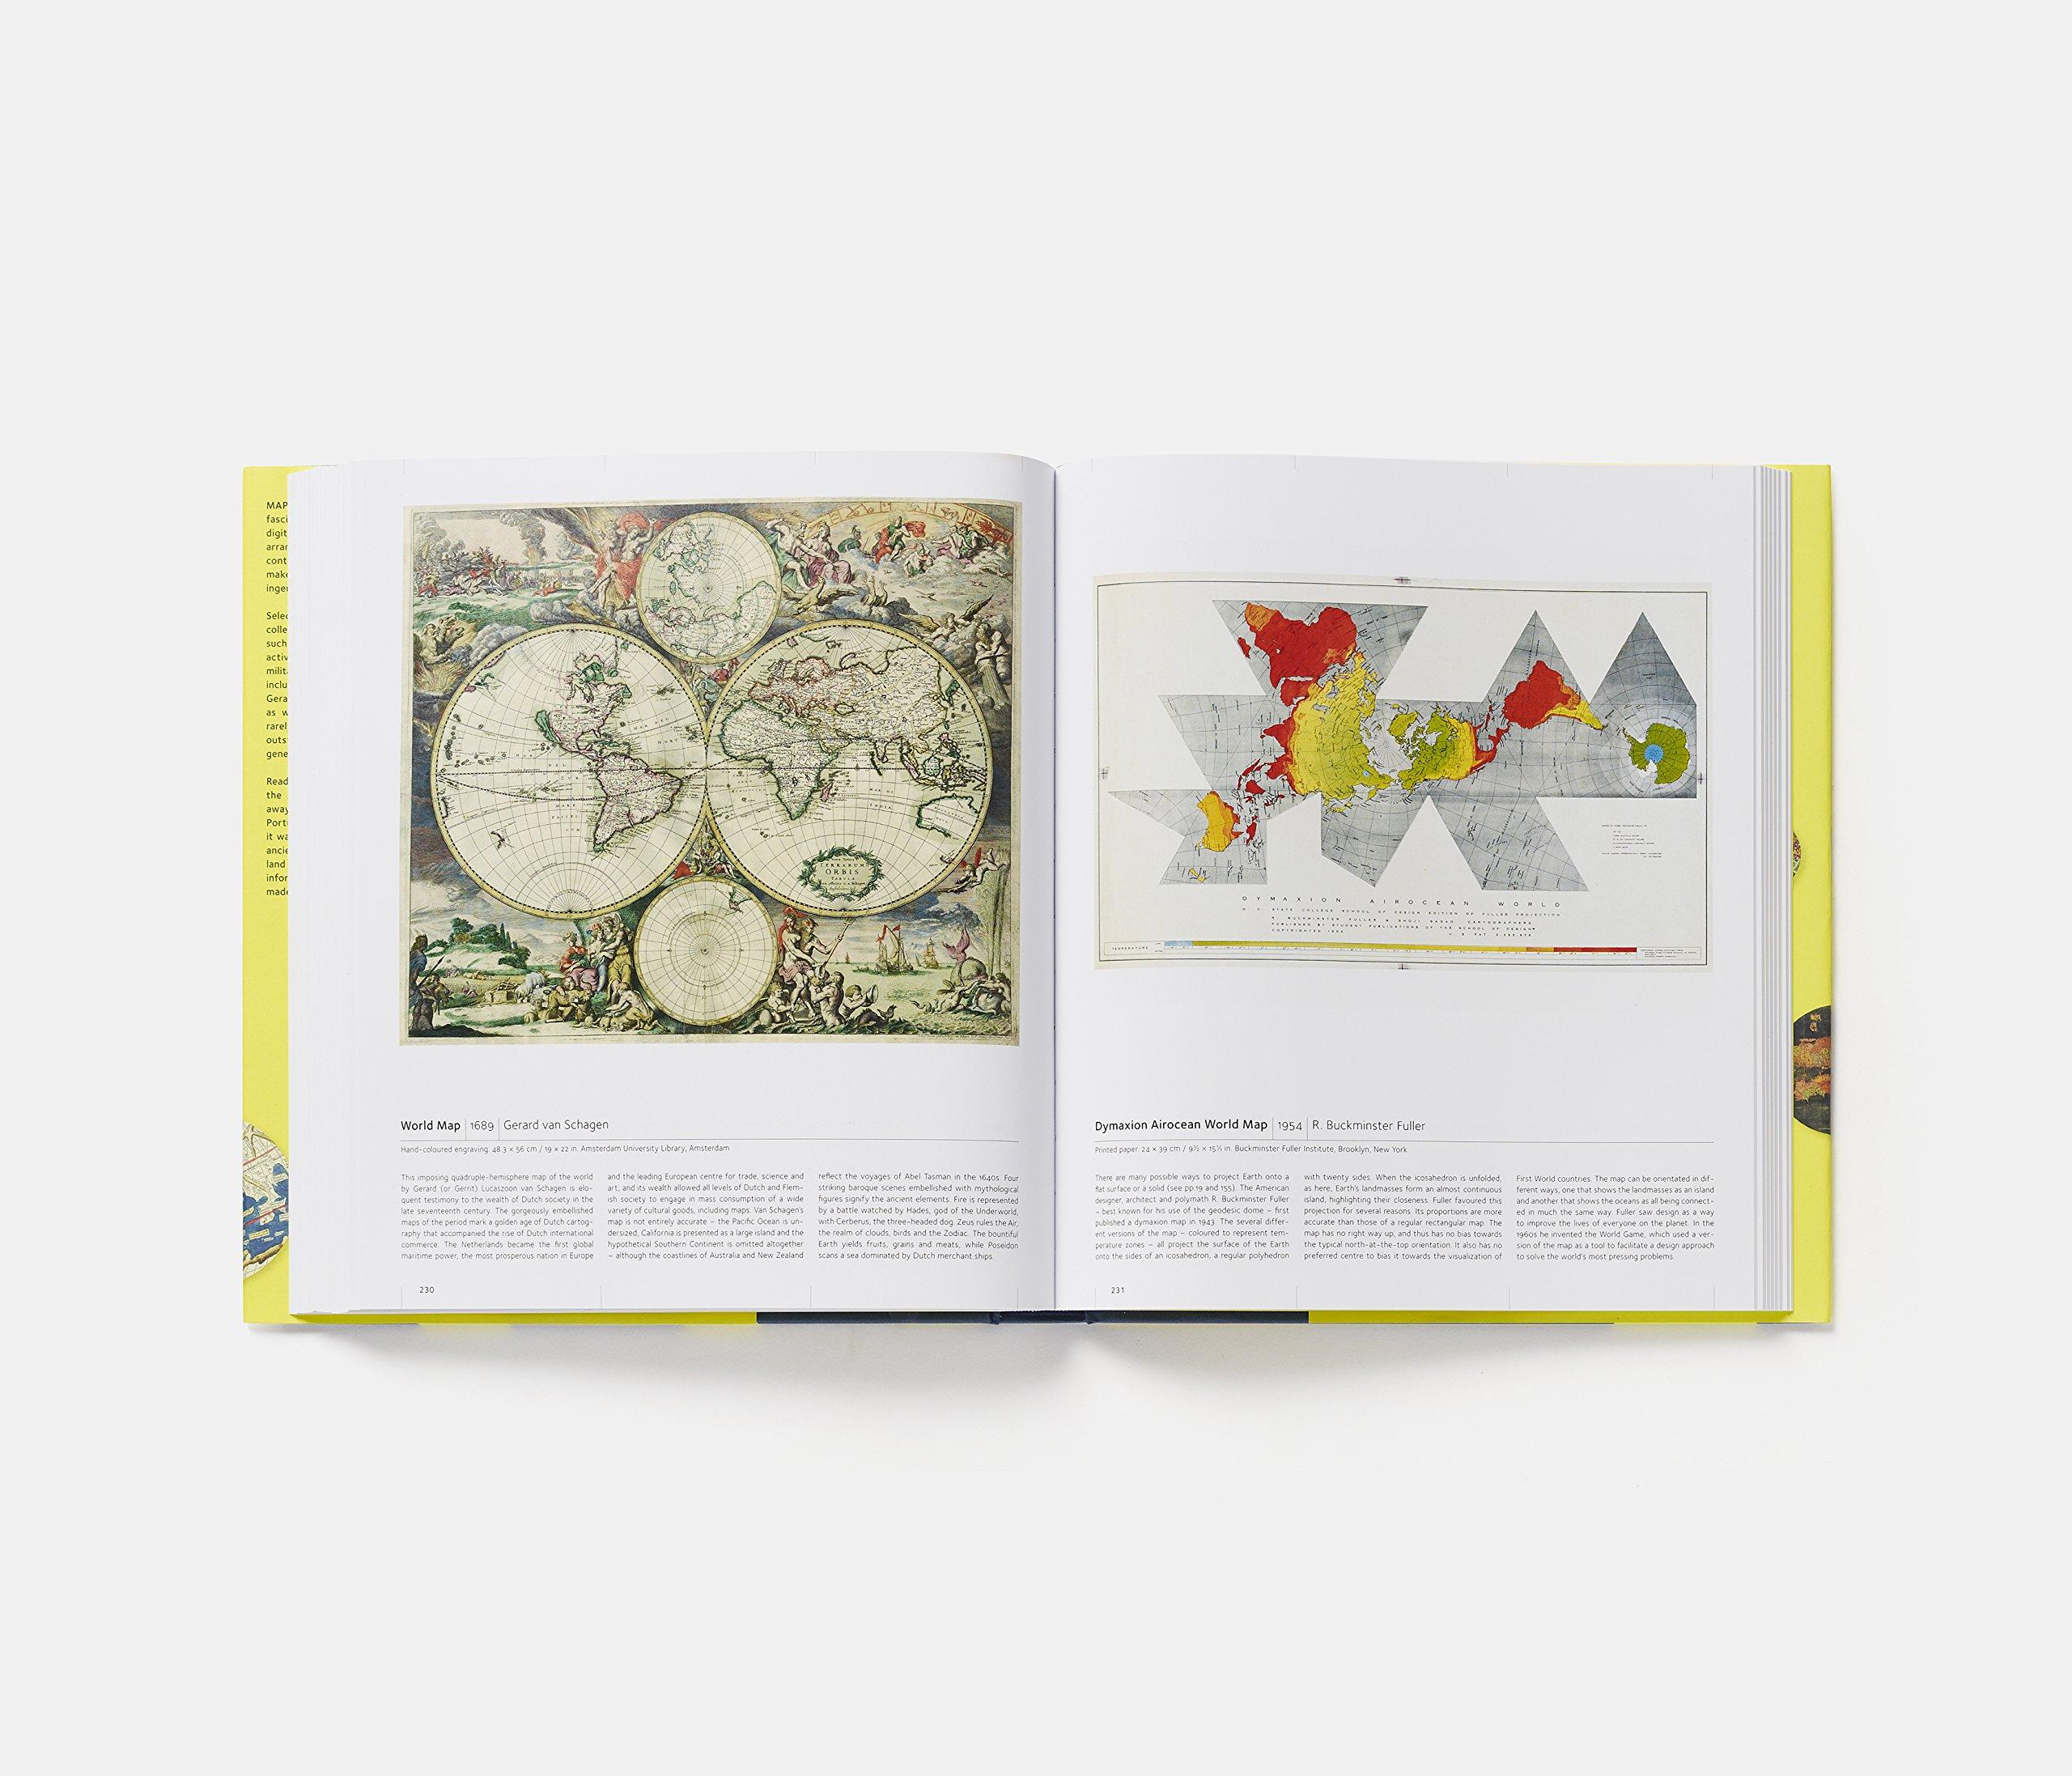 Map exploring the world phaidon editors john hessler map exploring the world phaidon editors john hessler 9780714869445 amazon books gumiabroncs Gallery